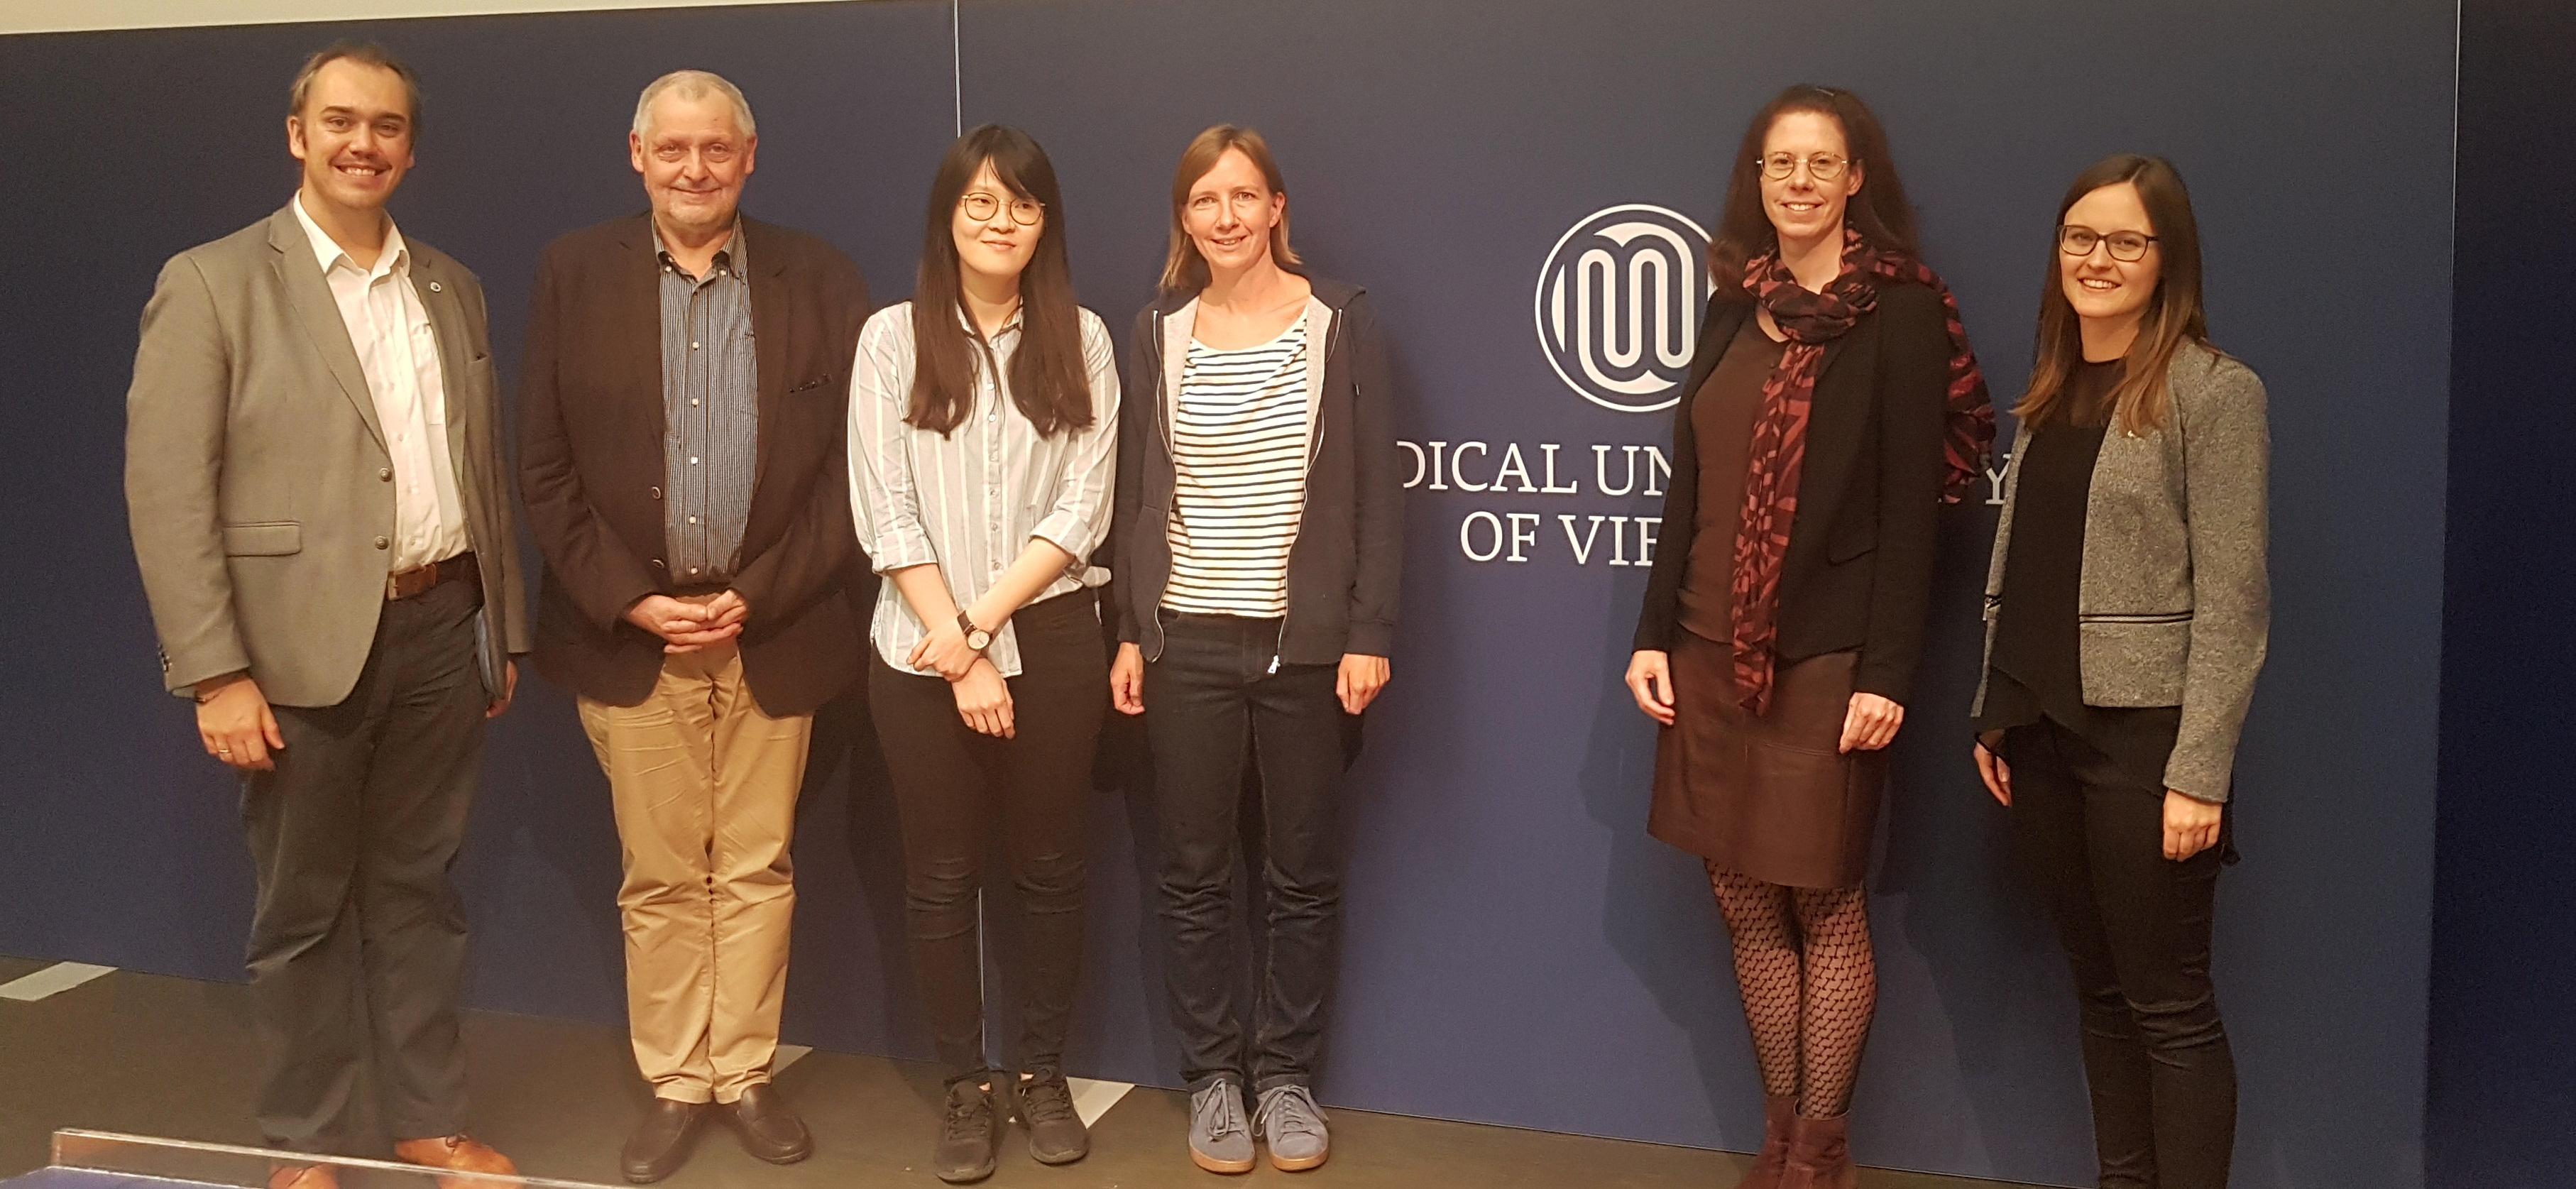 Hermann Agis, Gerhard Polak, Anna Cho, Katharina Seitz, Irene Maier, Carina Schöfl